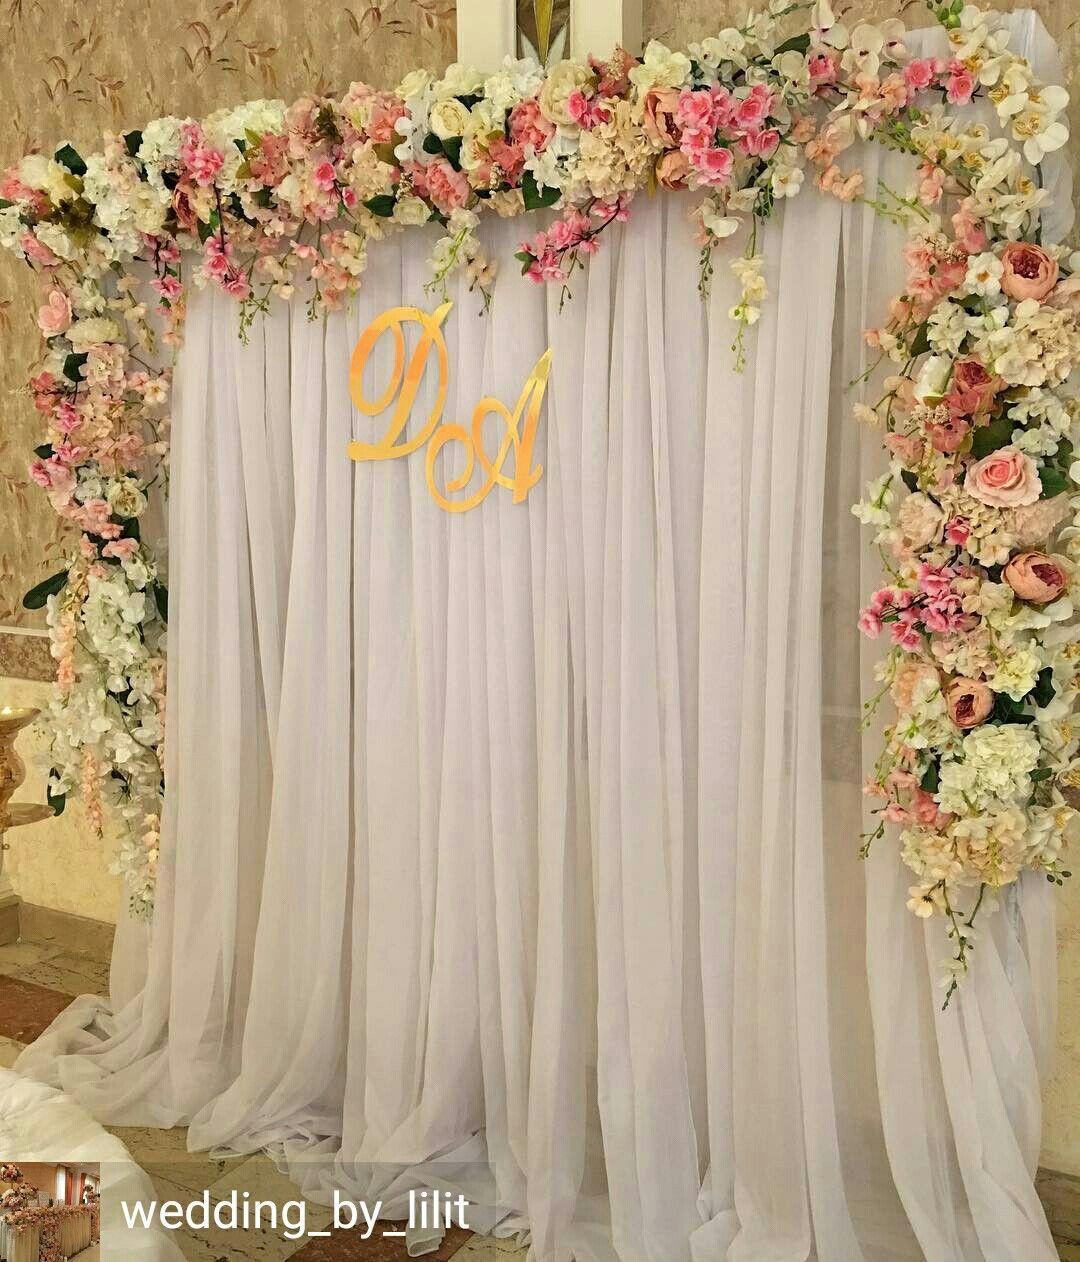 Engagement decoration | Engagement decorations, Wedding